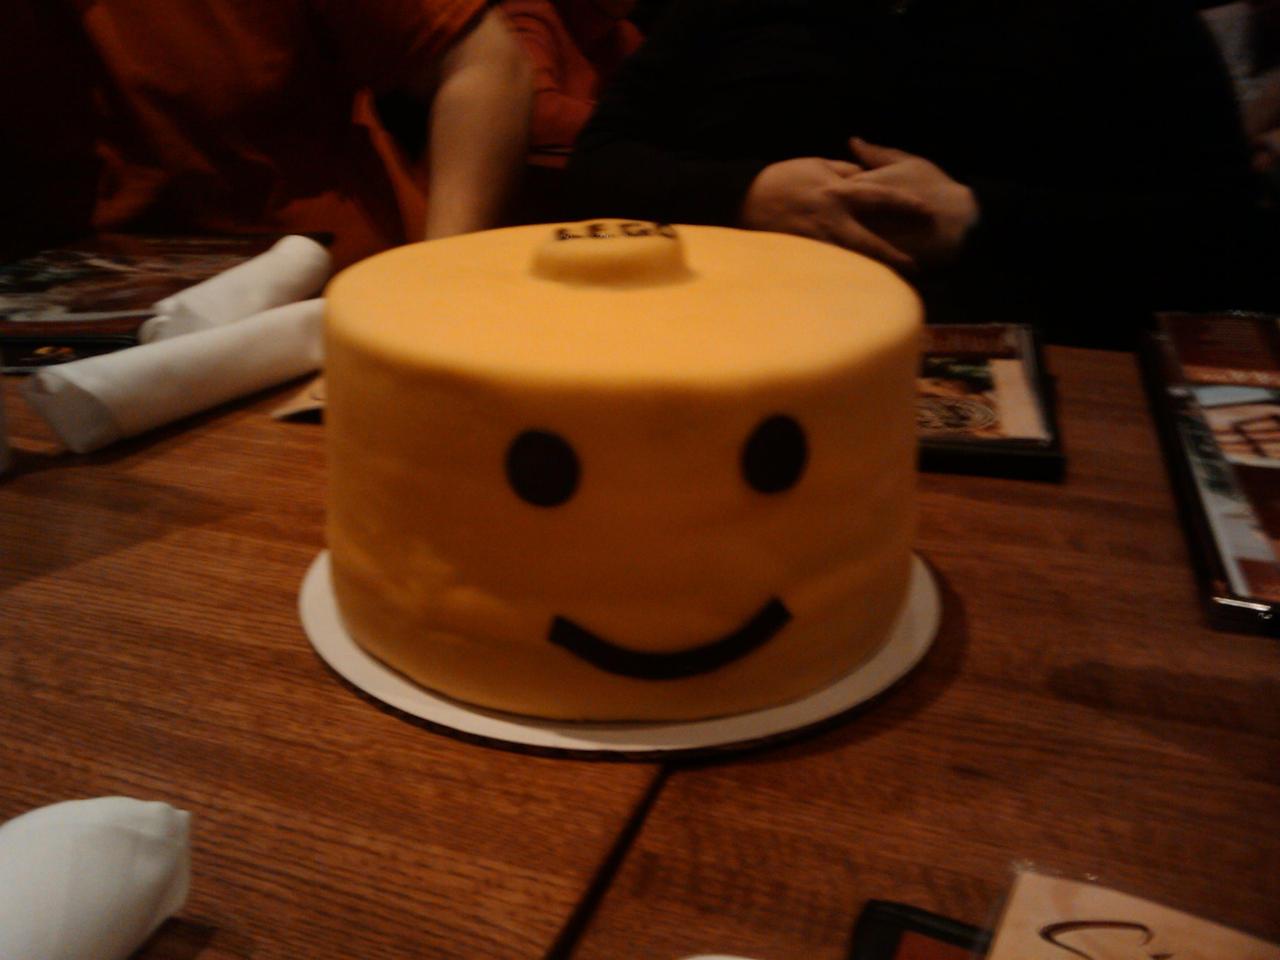 Best birthday cake ever by andrewdbarker on deviantart for How to make the best birthday cake ever